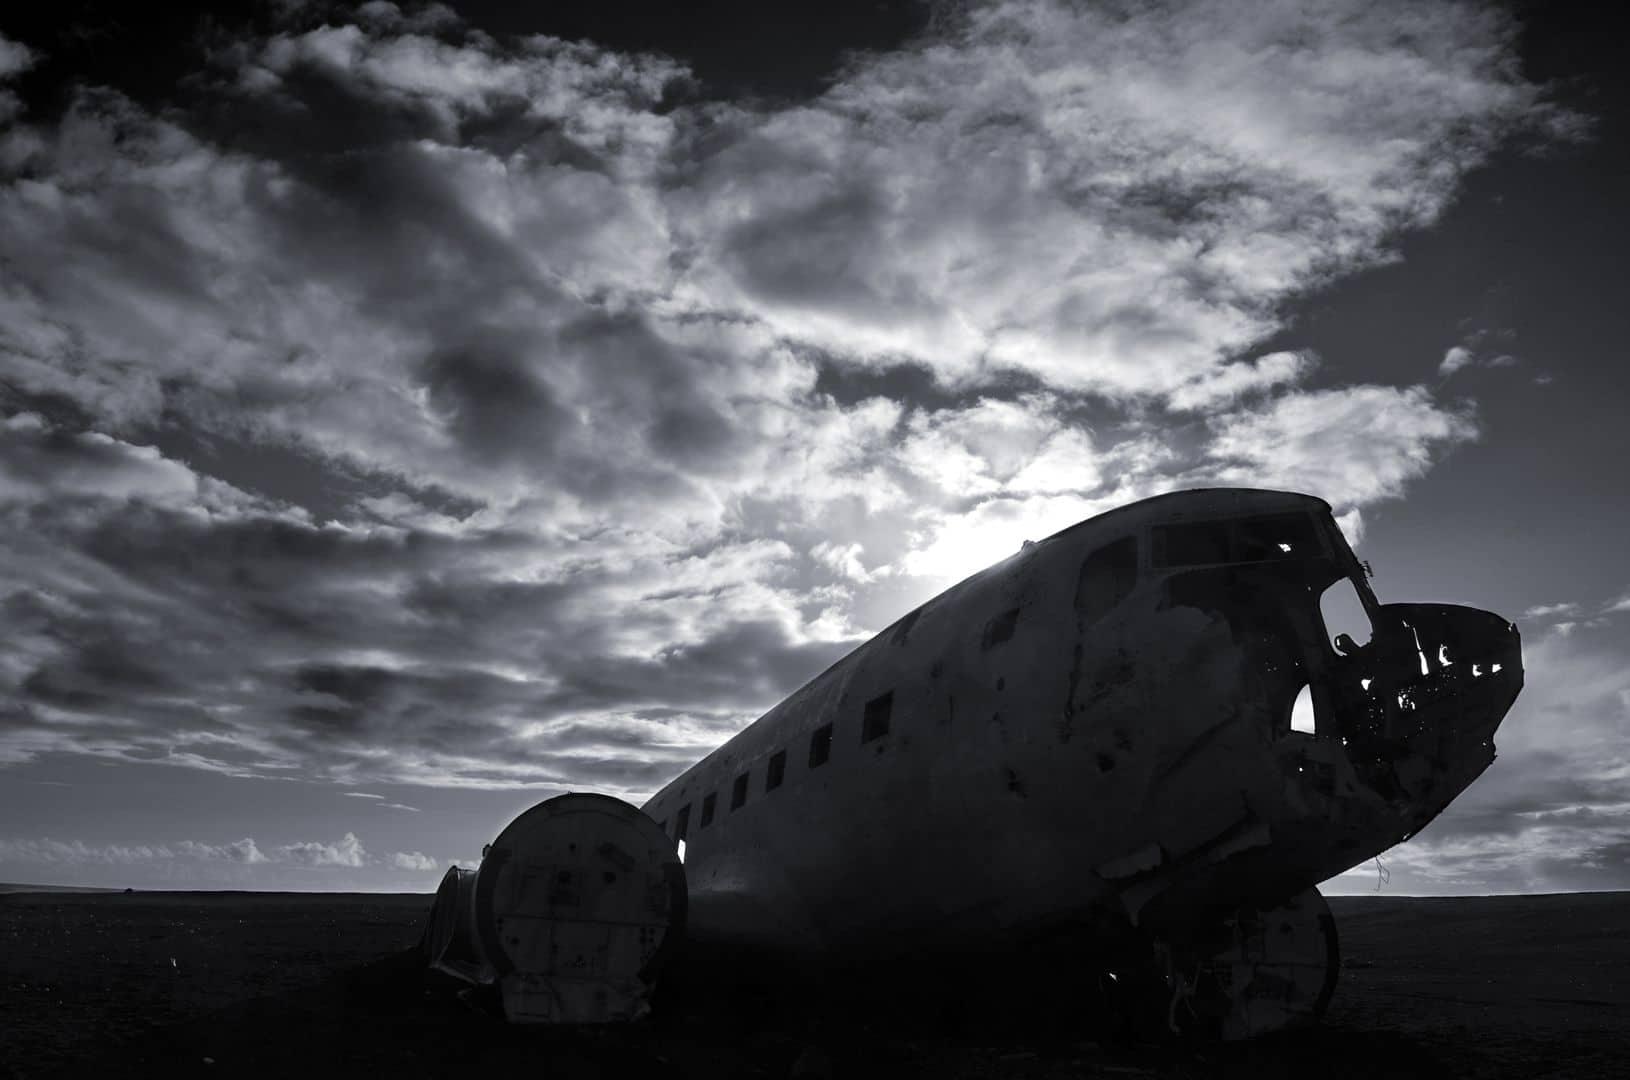 Auch das berühmte Flugzeugwrack am Strand hat uns fasziniert.